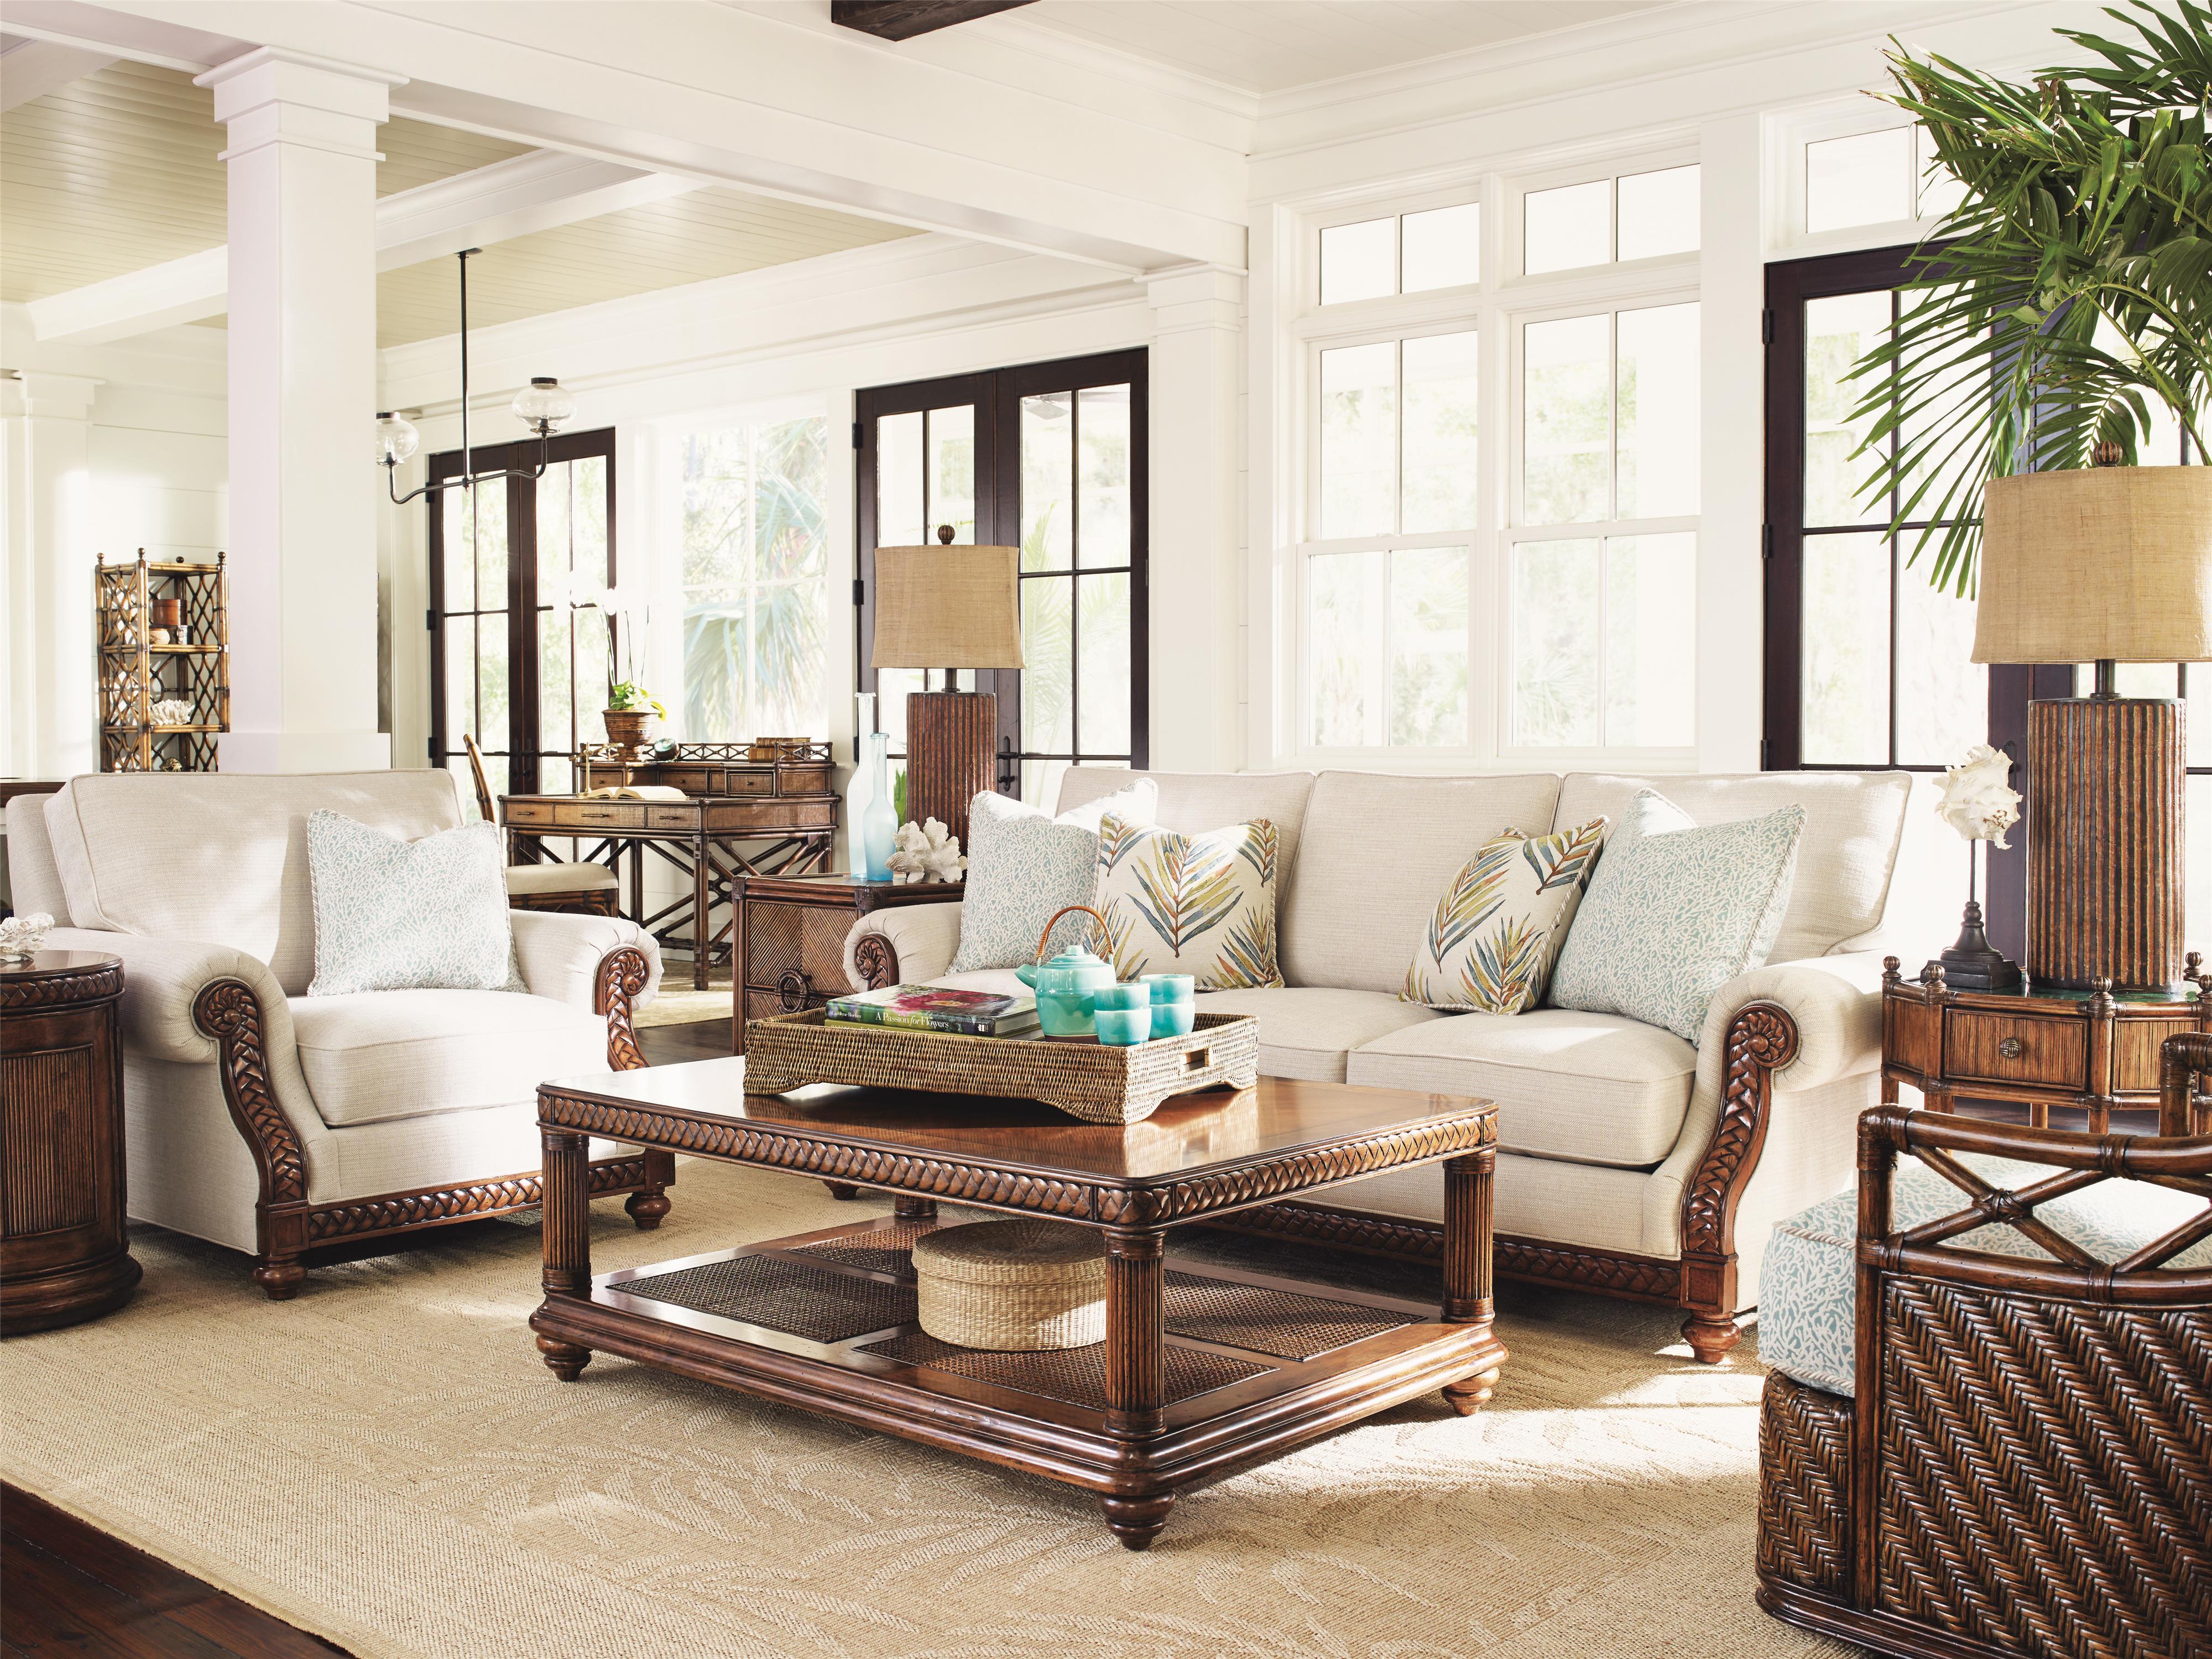 tommy bahama home bali hai stationary living room group baer 39 s furniture stationary living. Black Bedroom Furniture Sets. Home Design Ideas